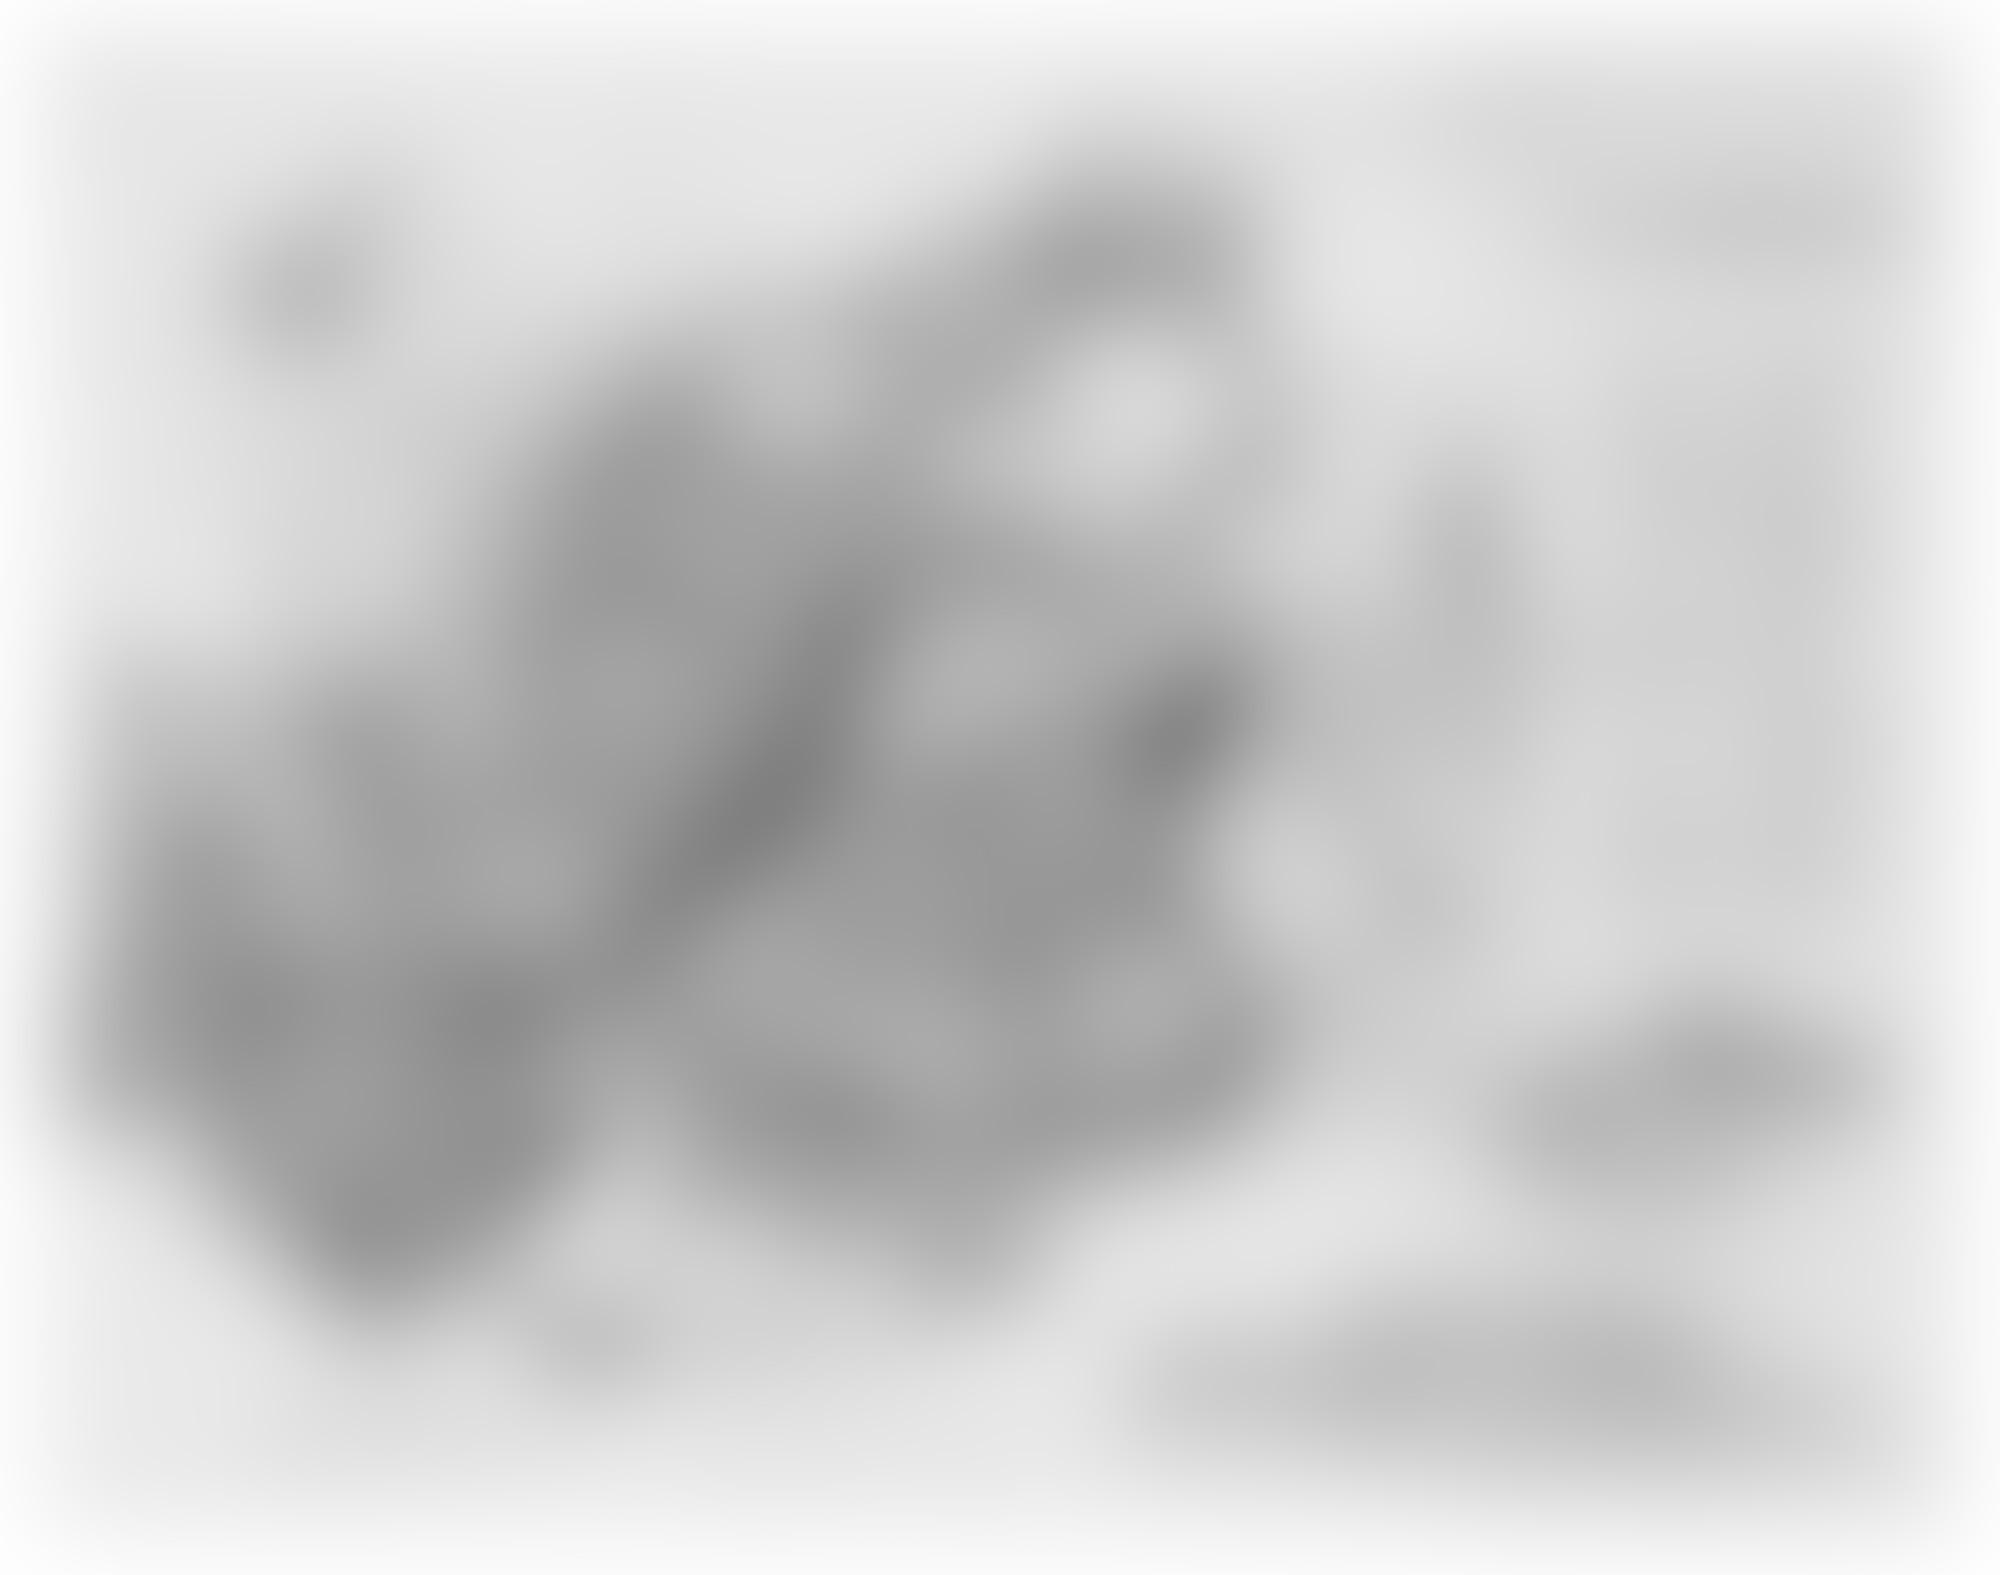 Tvc research 01 autocompressfitresizeixlibphp 1 1 0max h2000max w3 D2000q80sf229ee7607f30e803c5d7229c53fcfe0